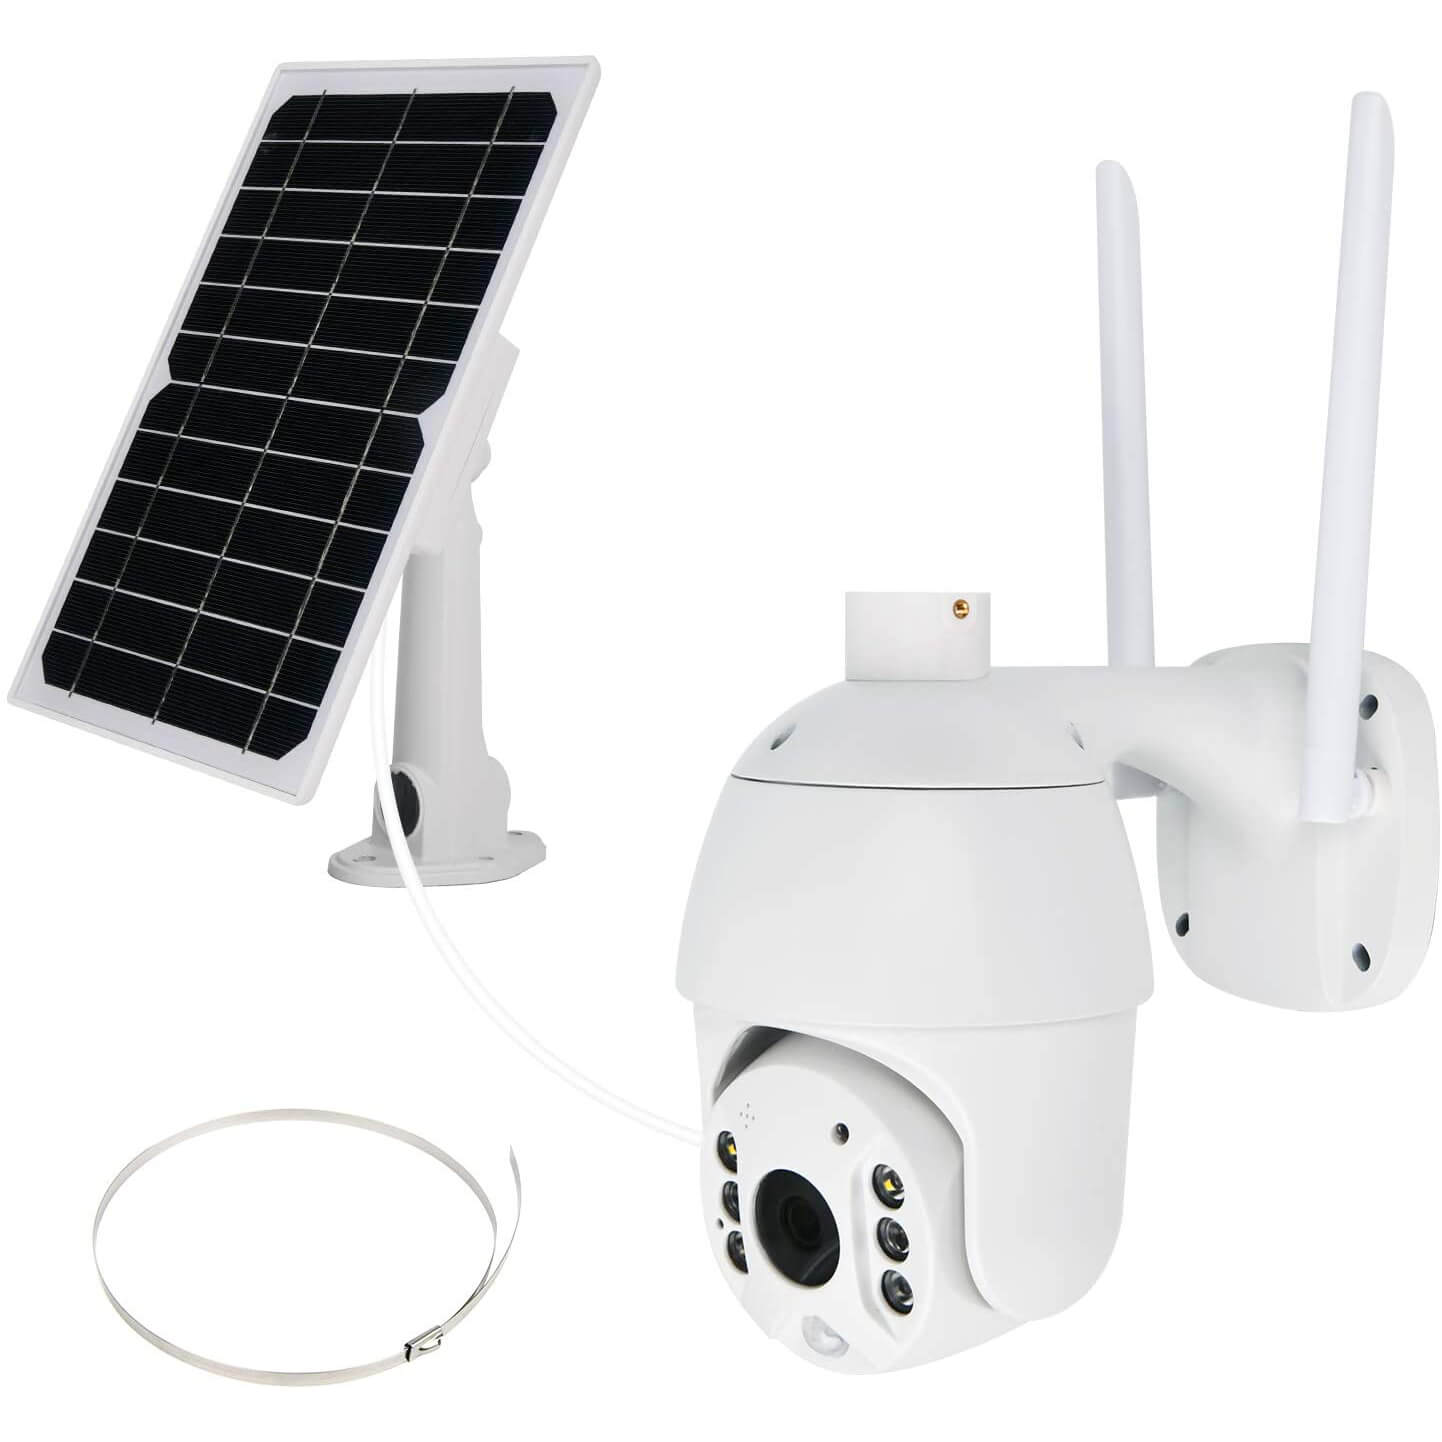 NuCam Solar Powered PTZ WiFi Security Camera